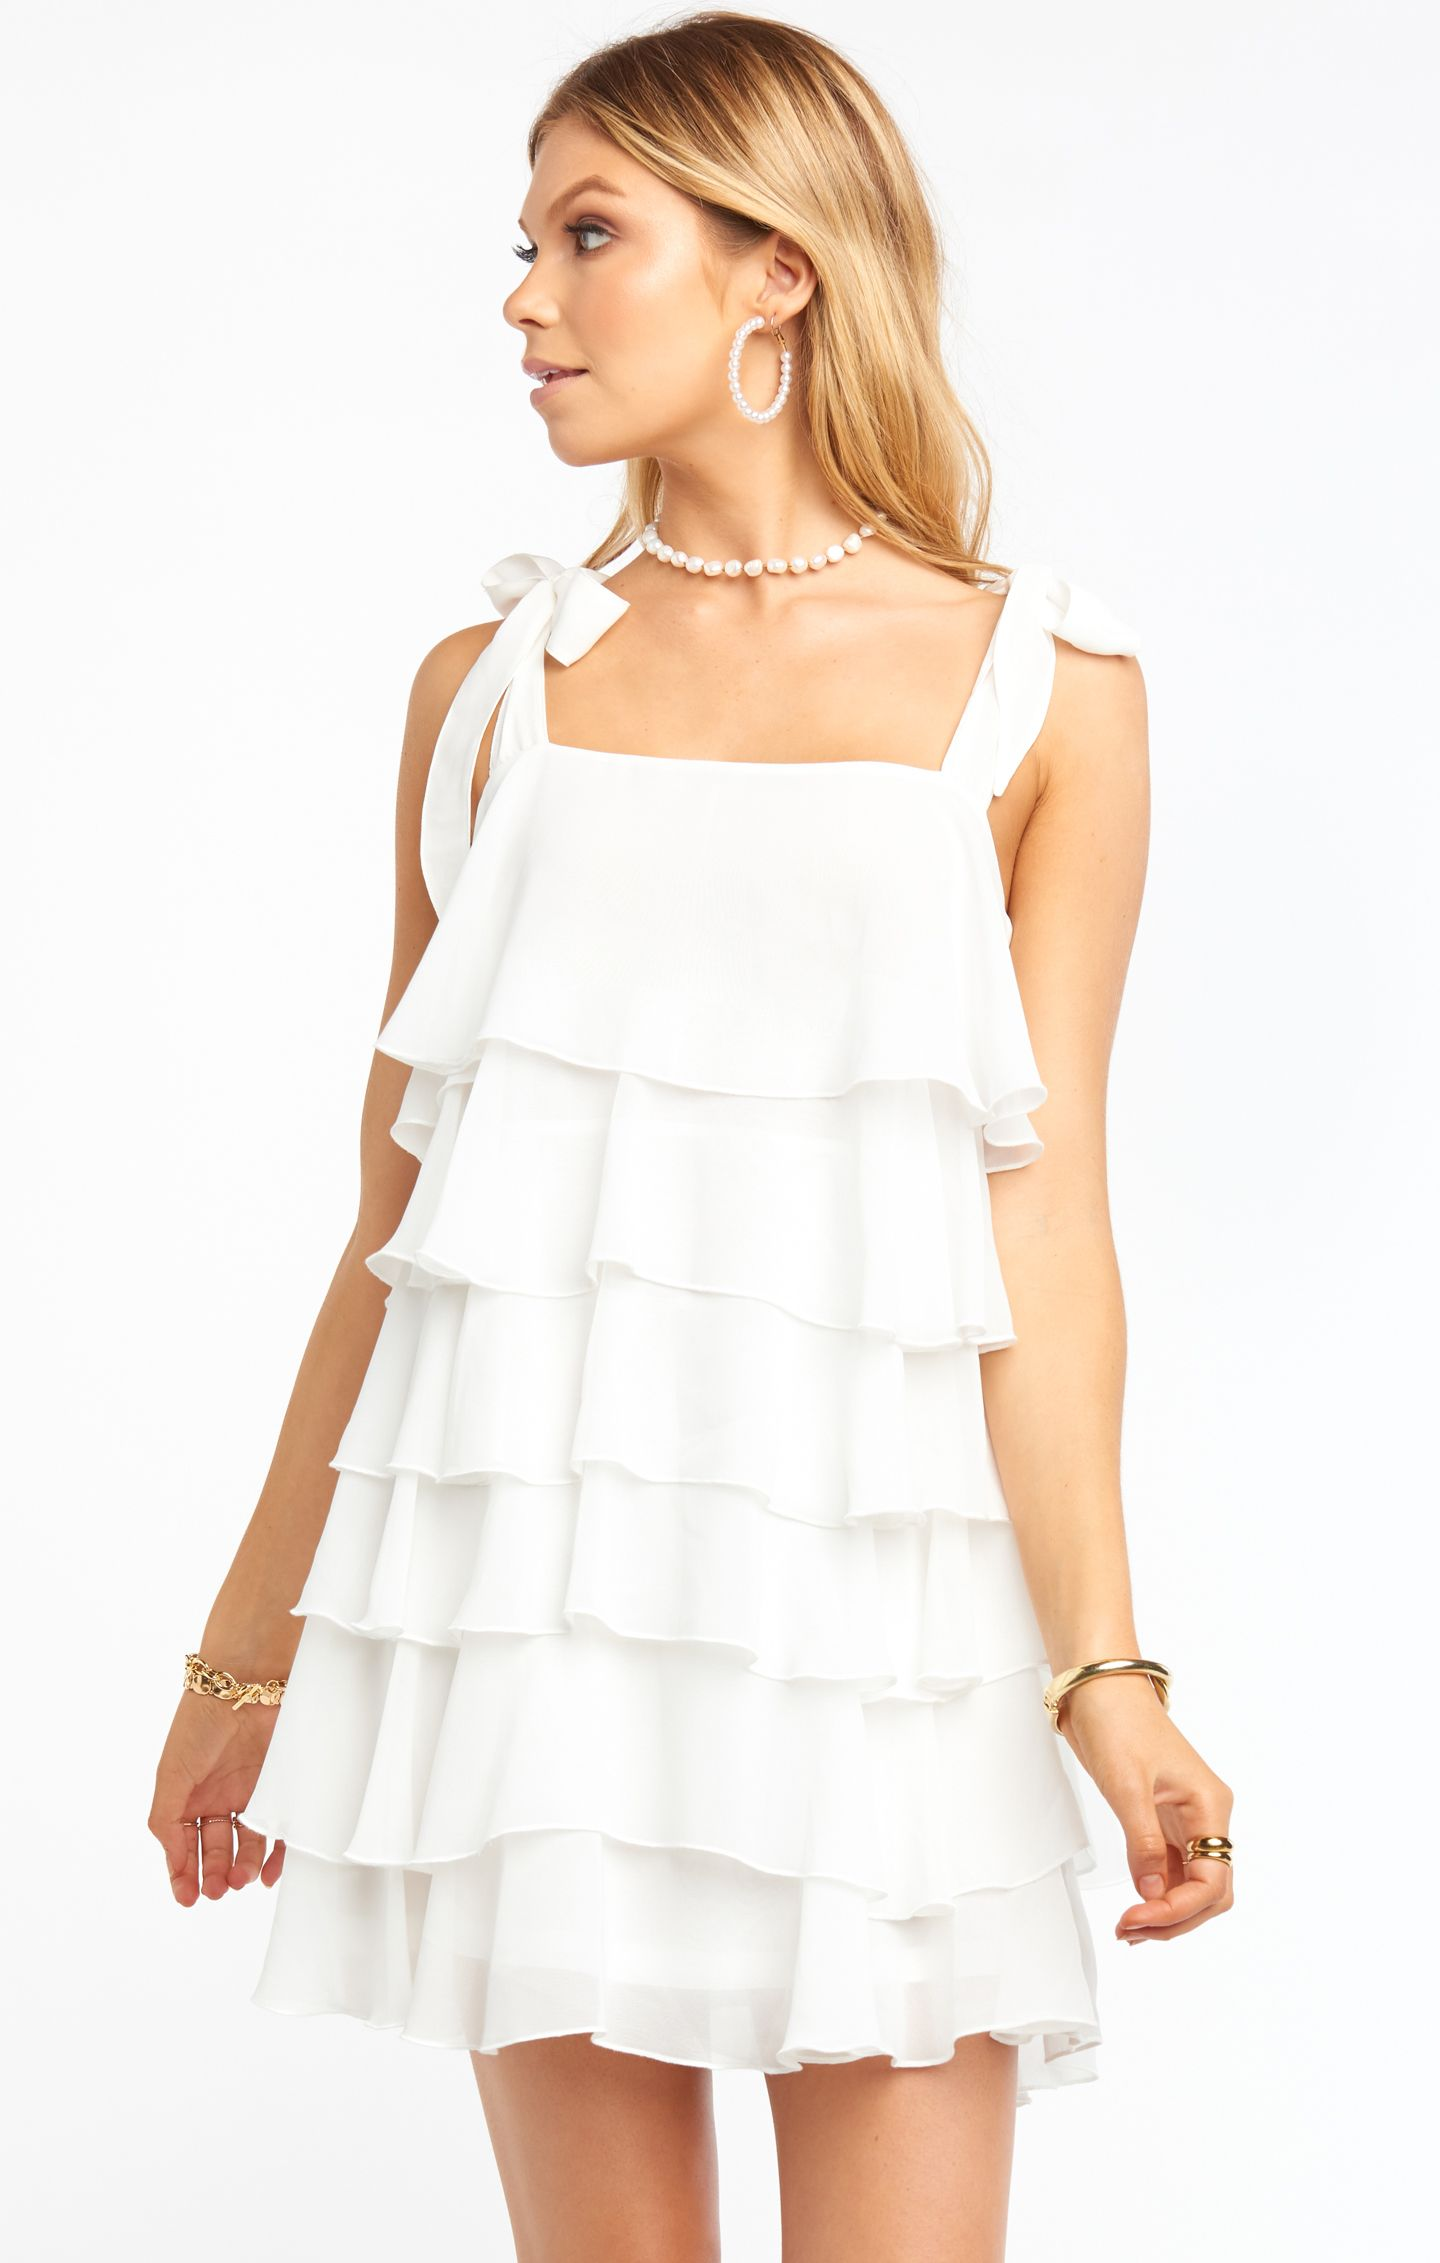 Rowen Ruffle Dress White White Dresses Graduation Cute White Dress Elegant White Dress [ 2263 x 1440 Pixel ]